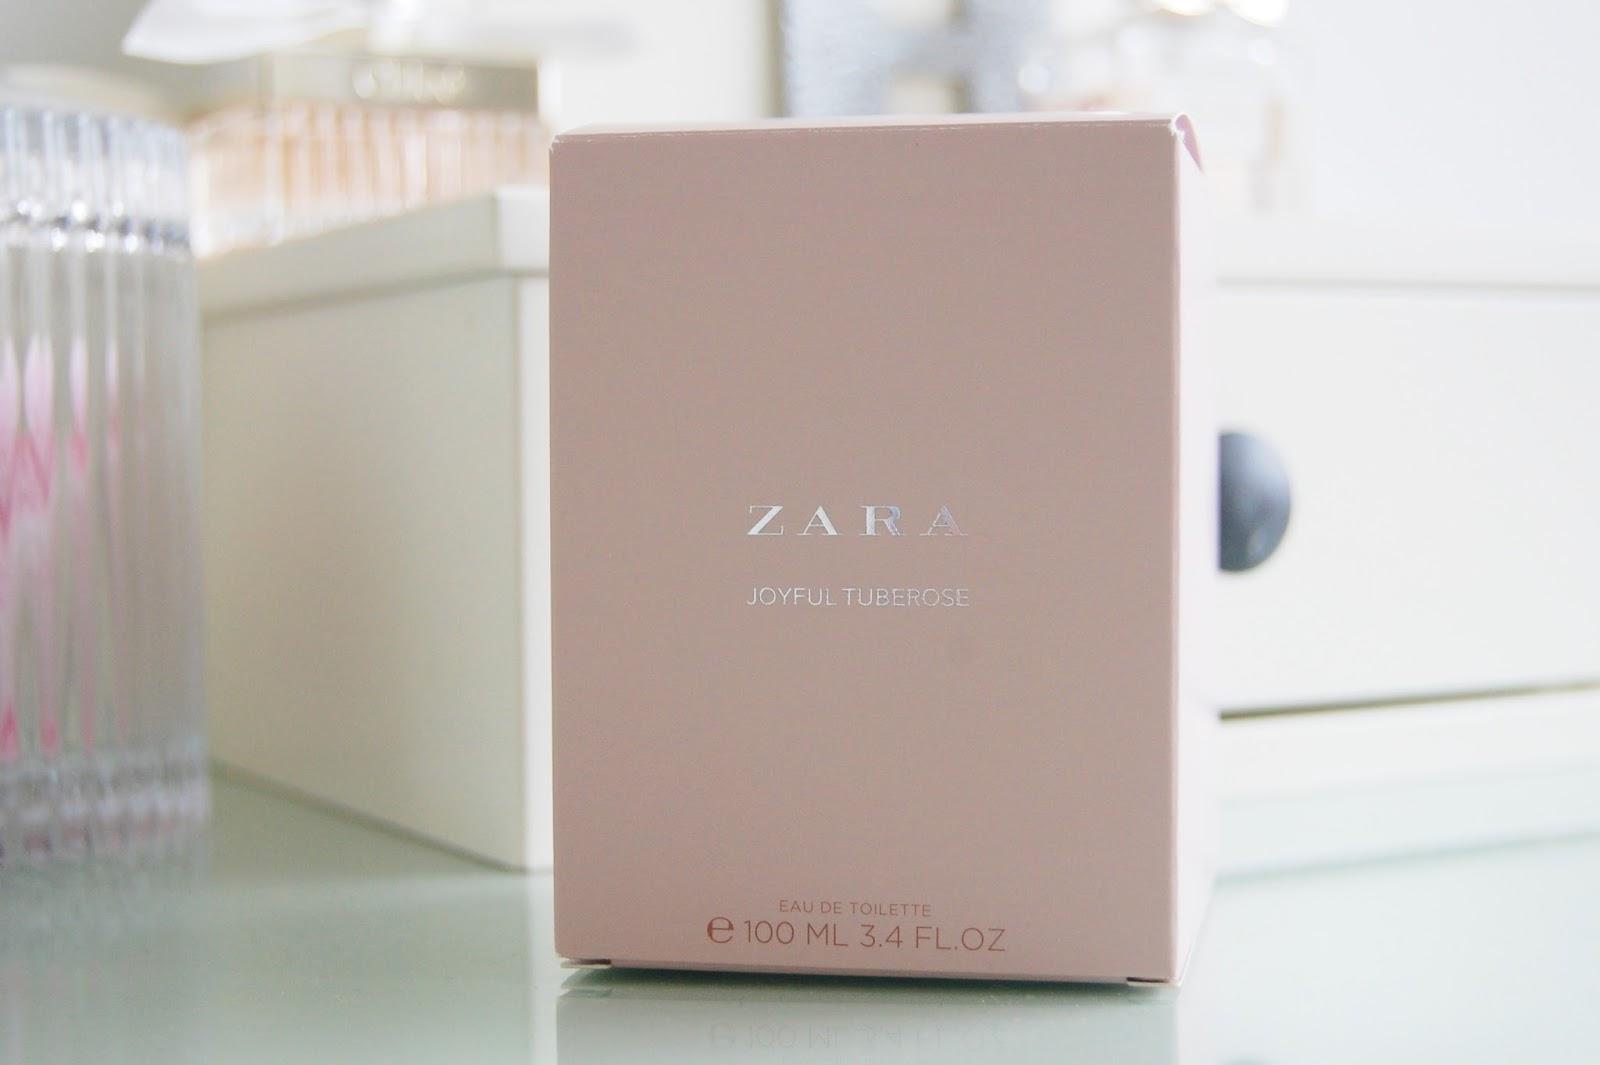 Tuberose Perfume Zara